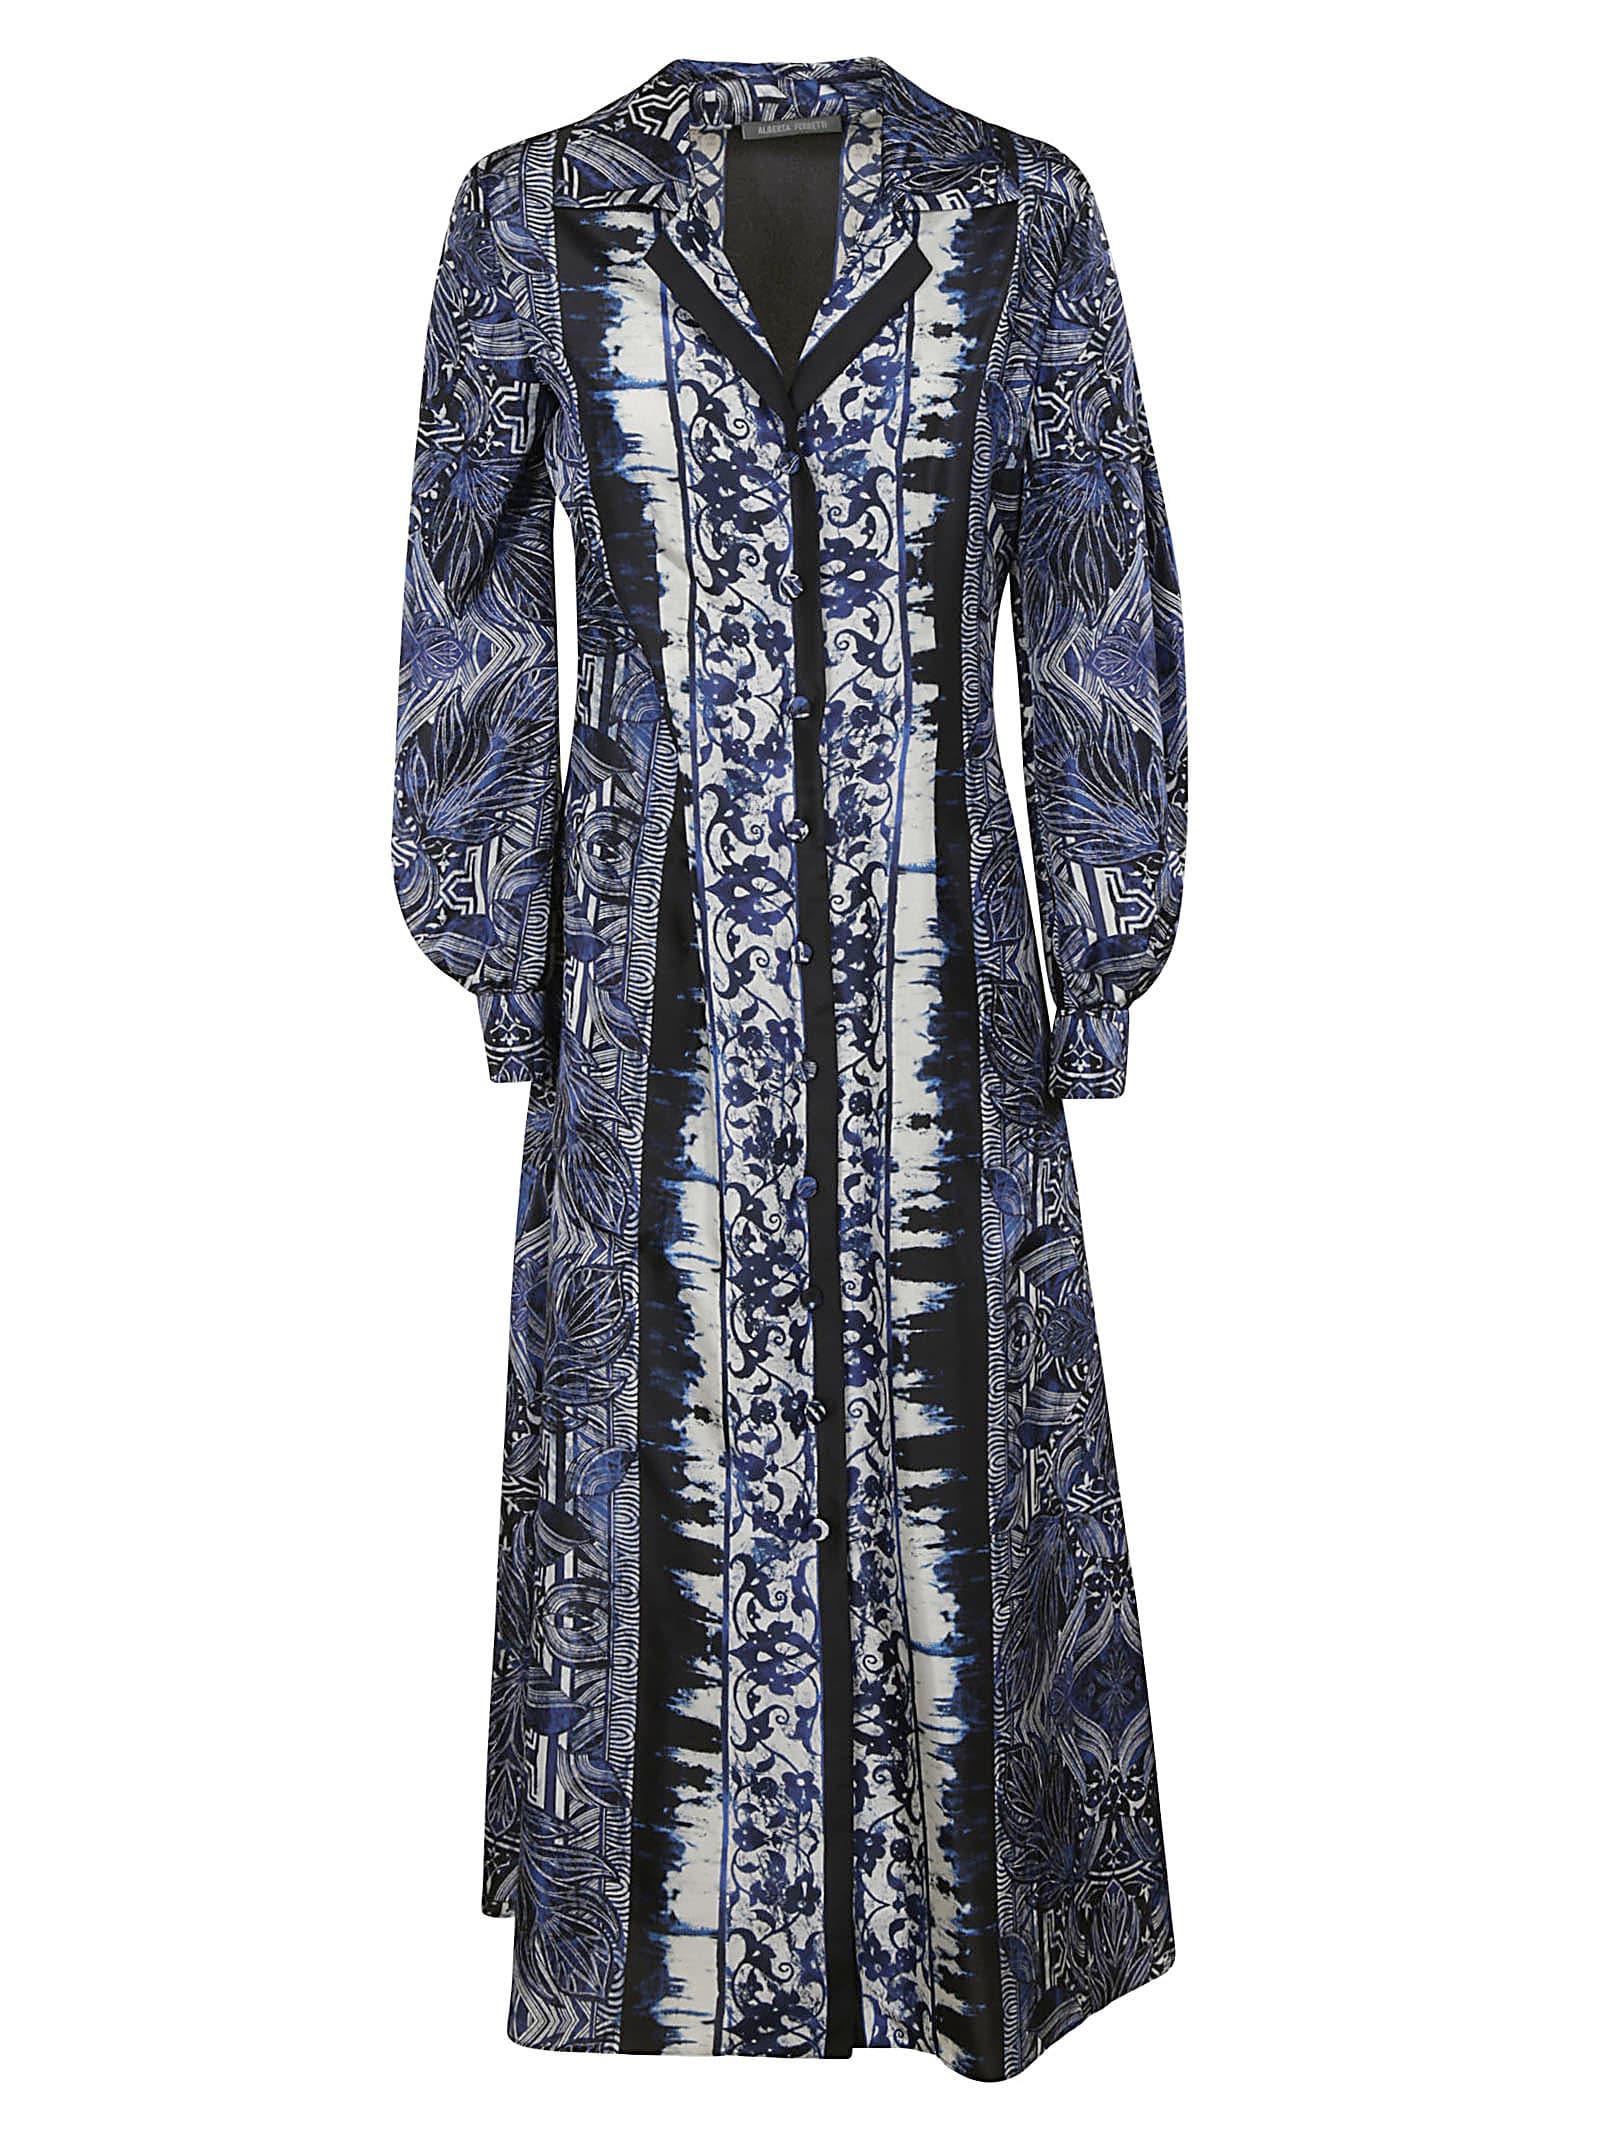 Alberta Ferretti Patterned Long Shirt Dress